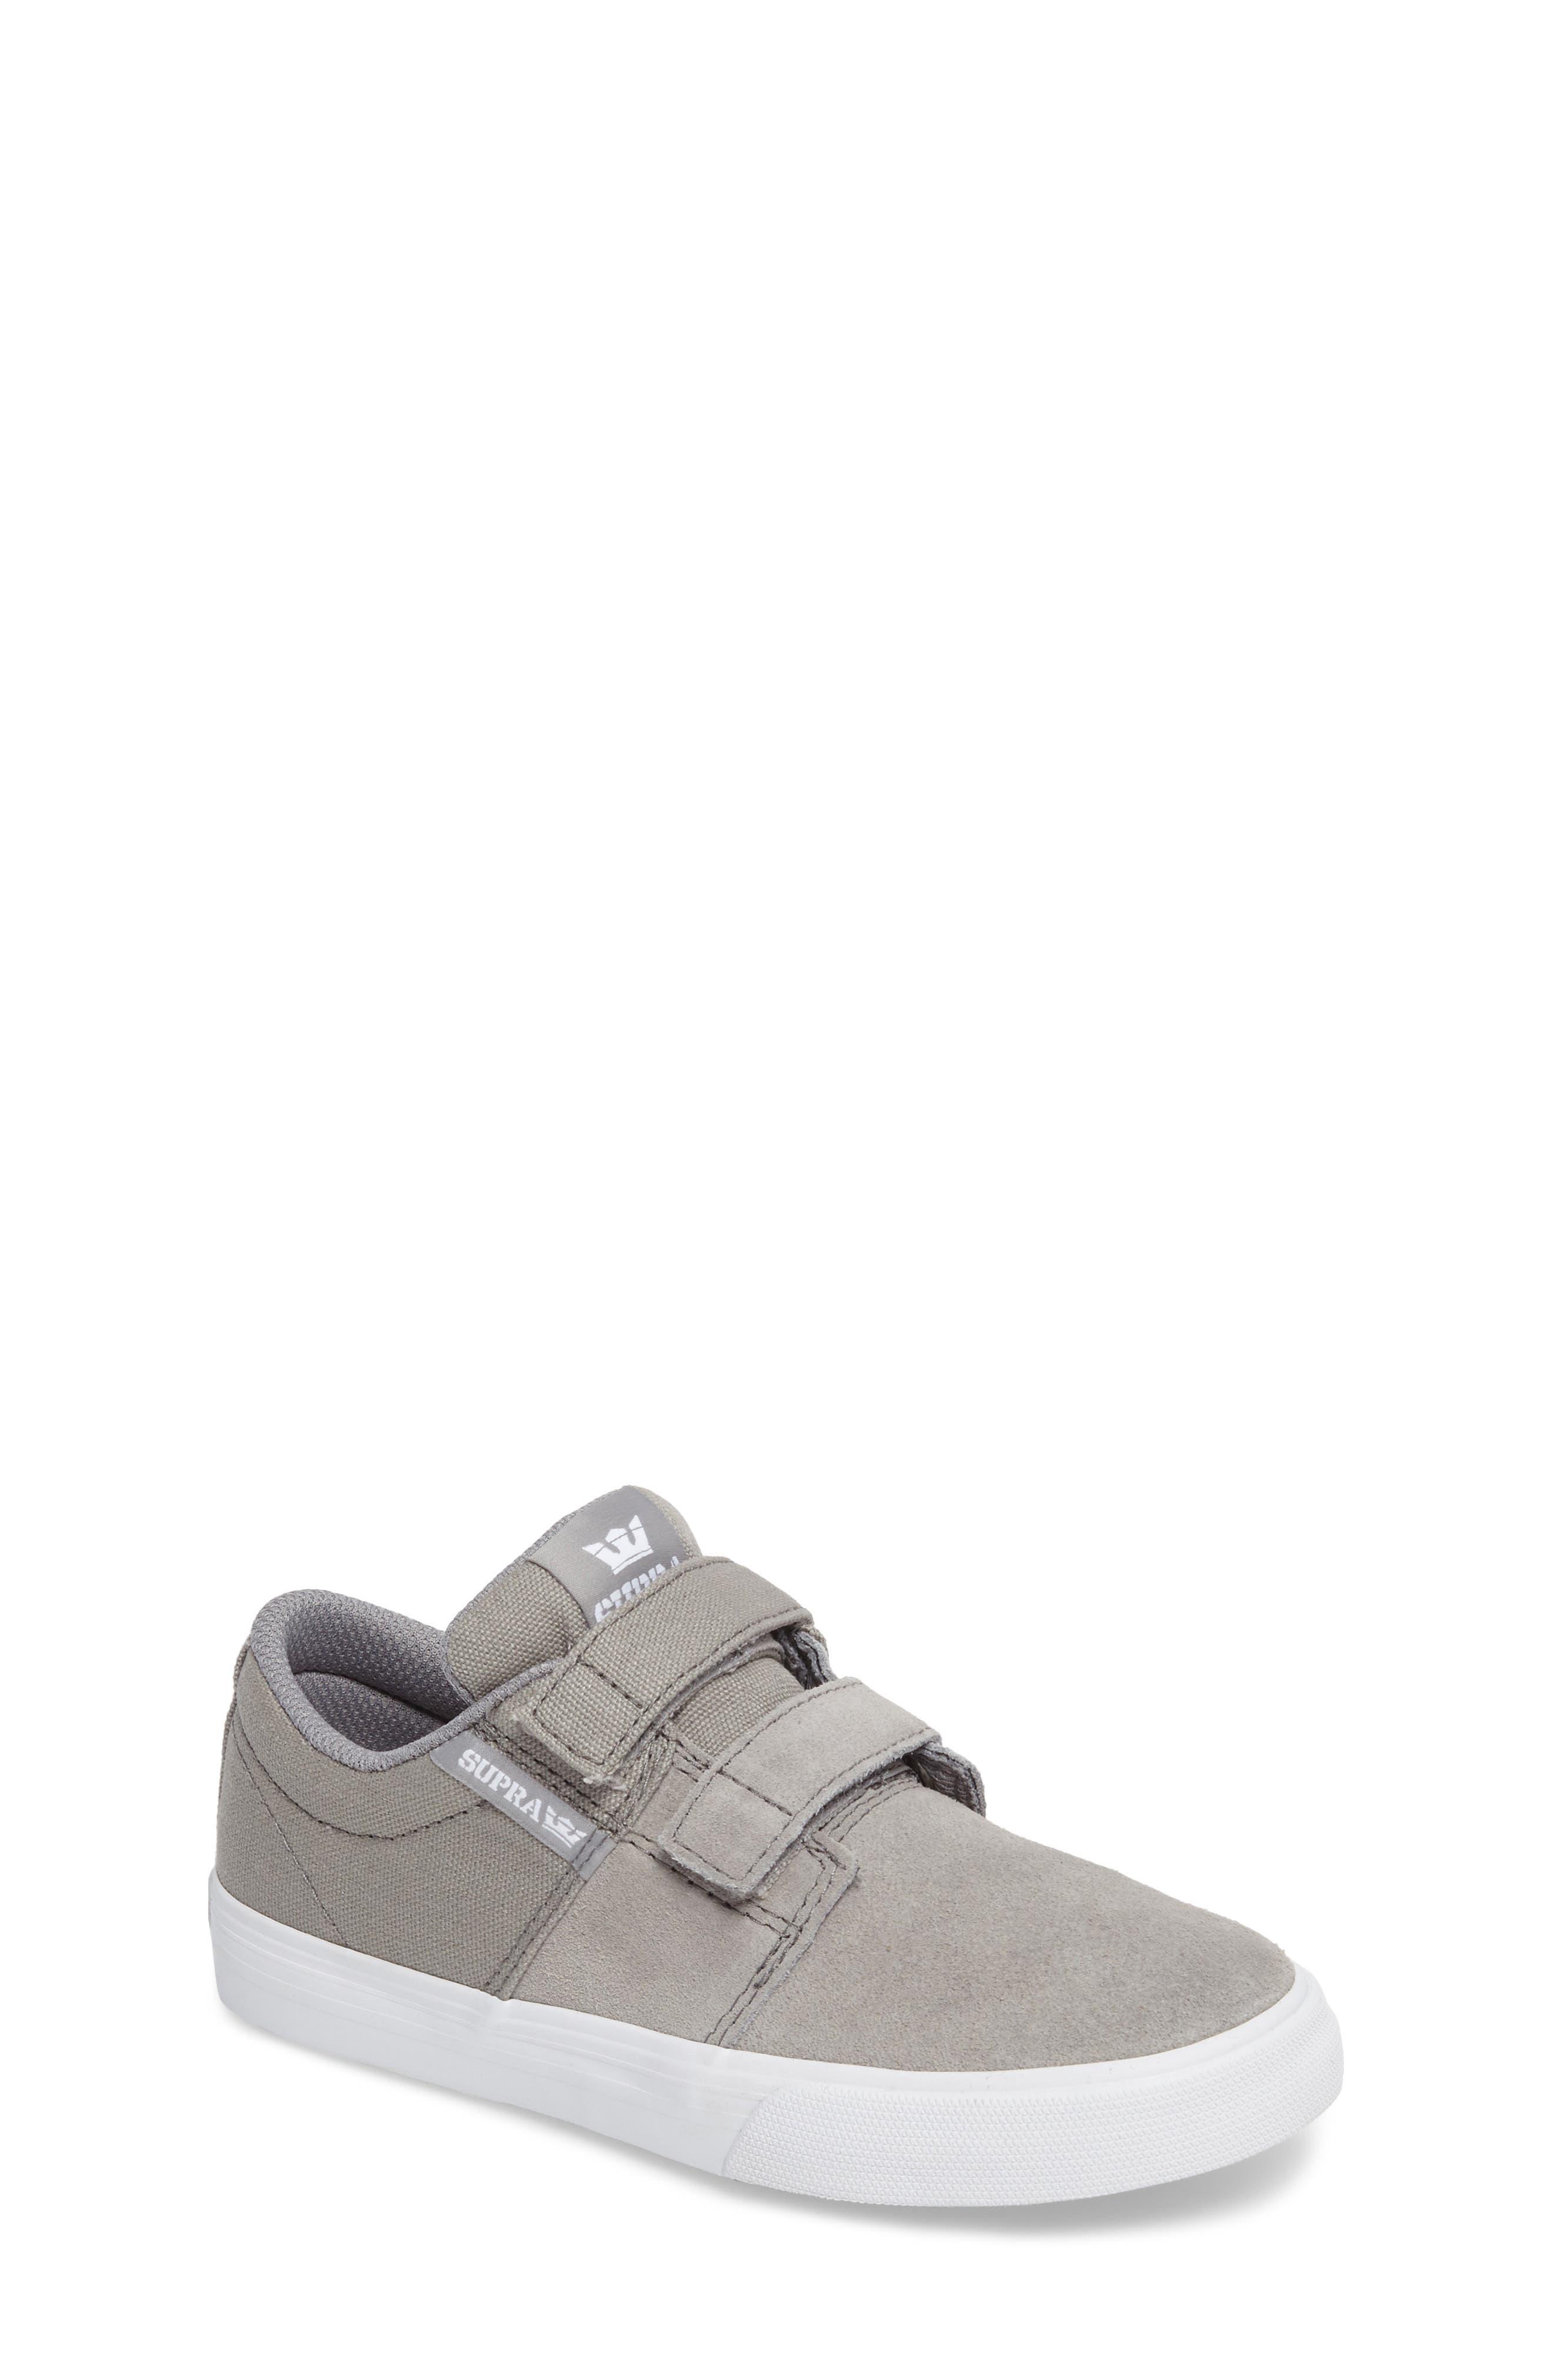 Alternate Image 1 Selected - Supra Stacks Low Top Sneaker (Toddler, Little Kid & Big Kid)